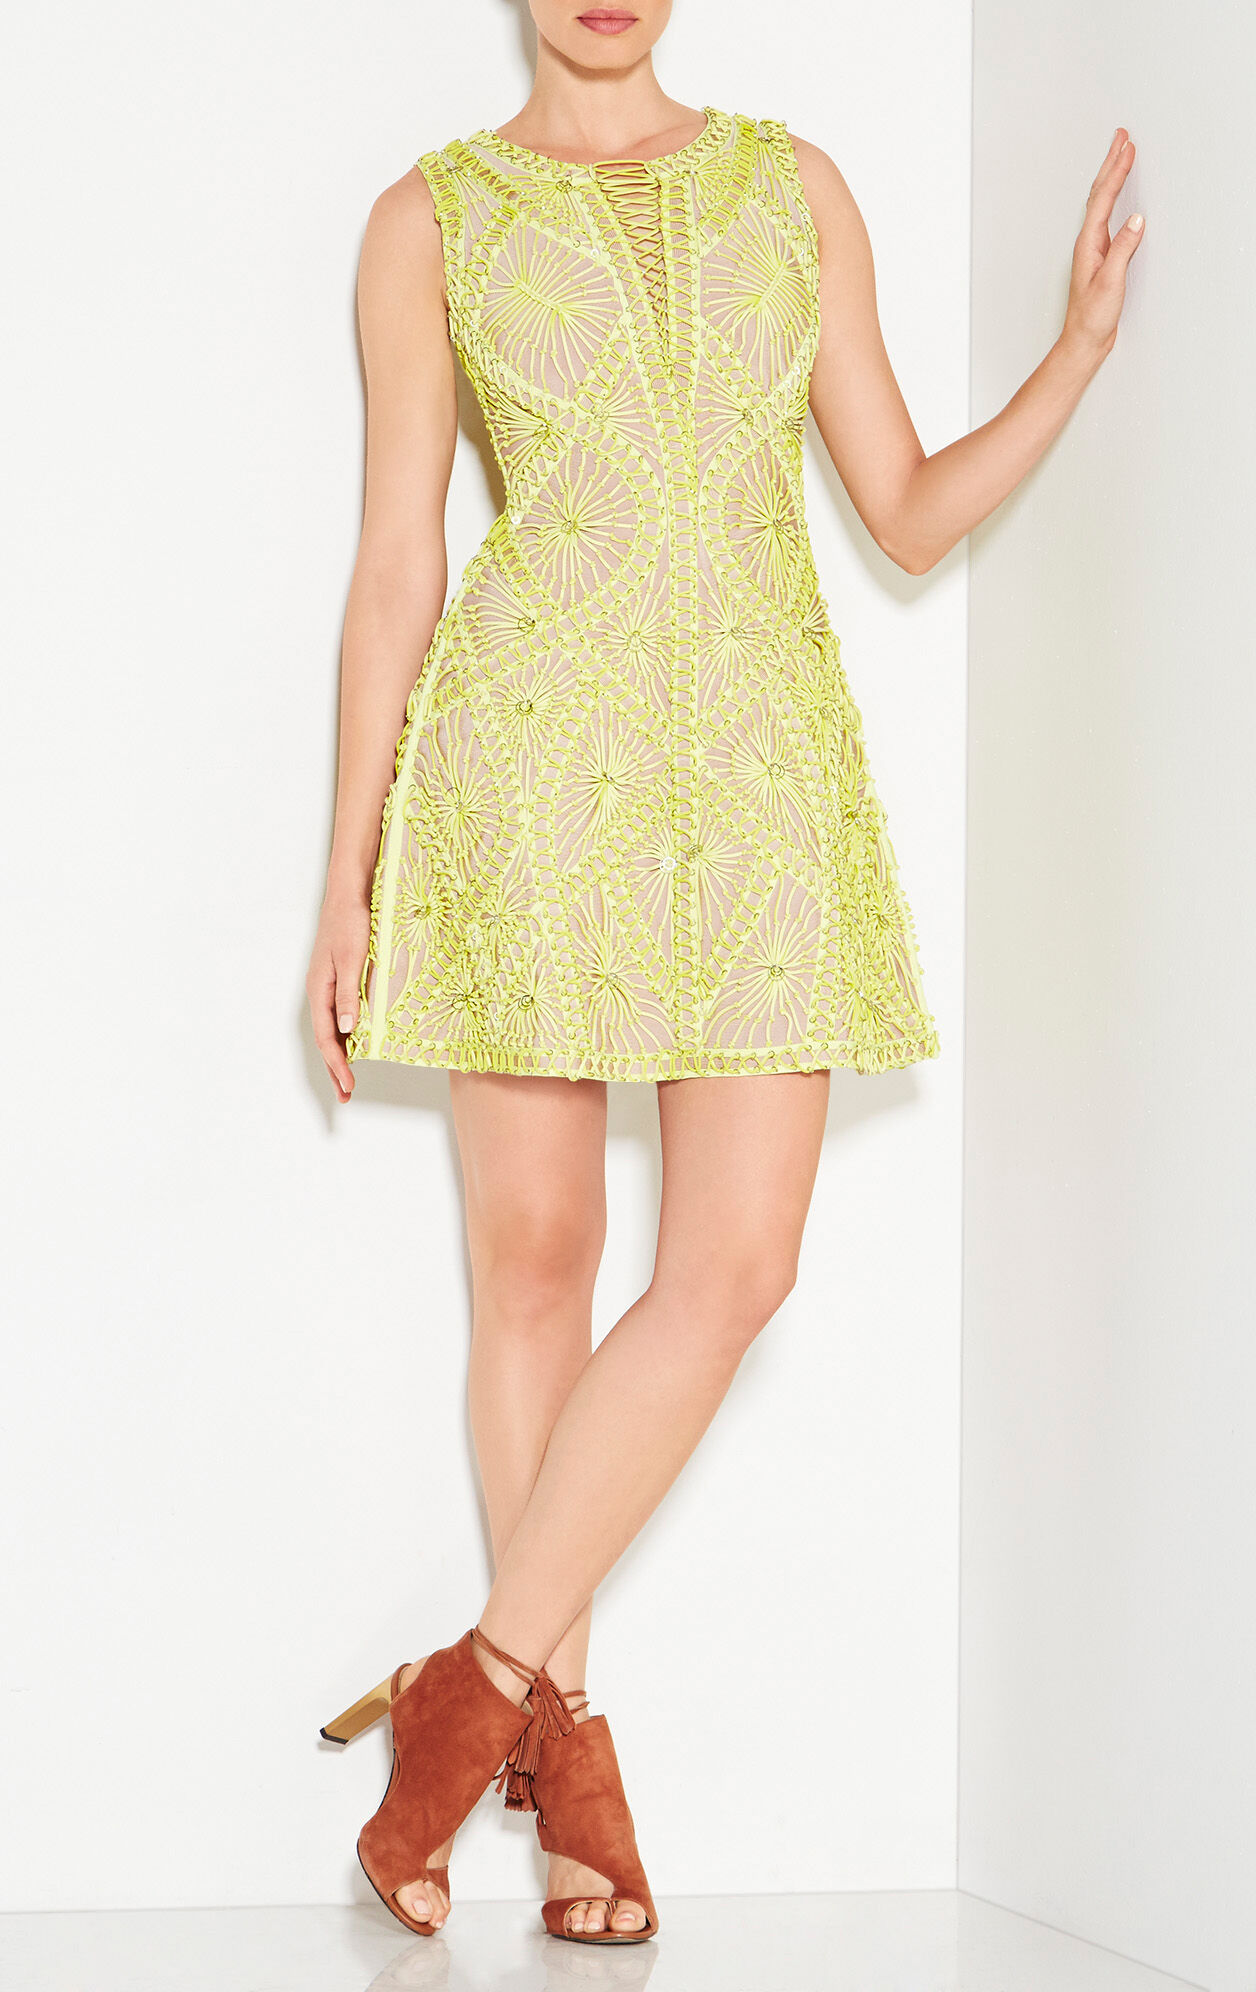 Vitoria Sunburst Knotted Lacing Rings Dress